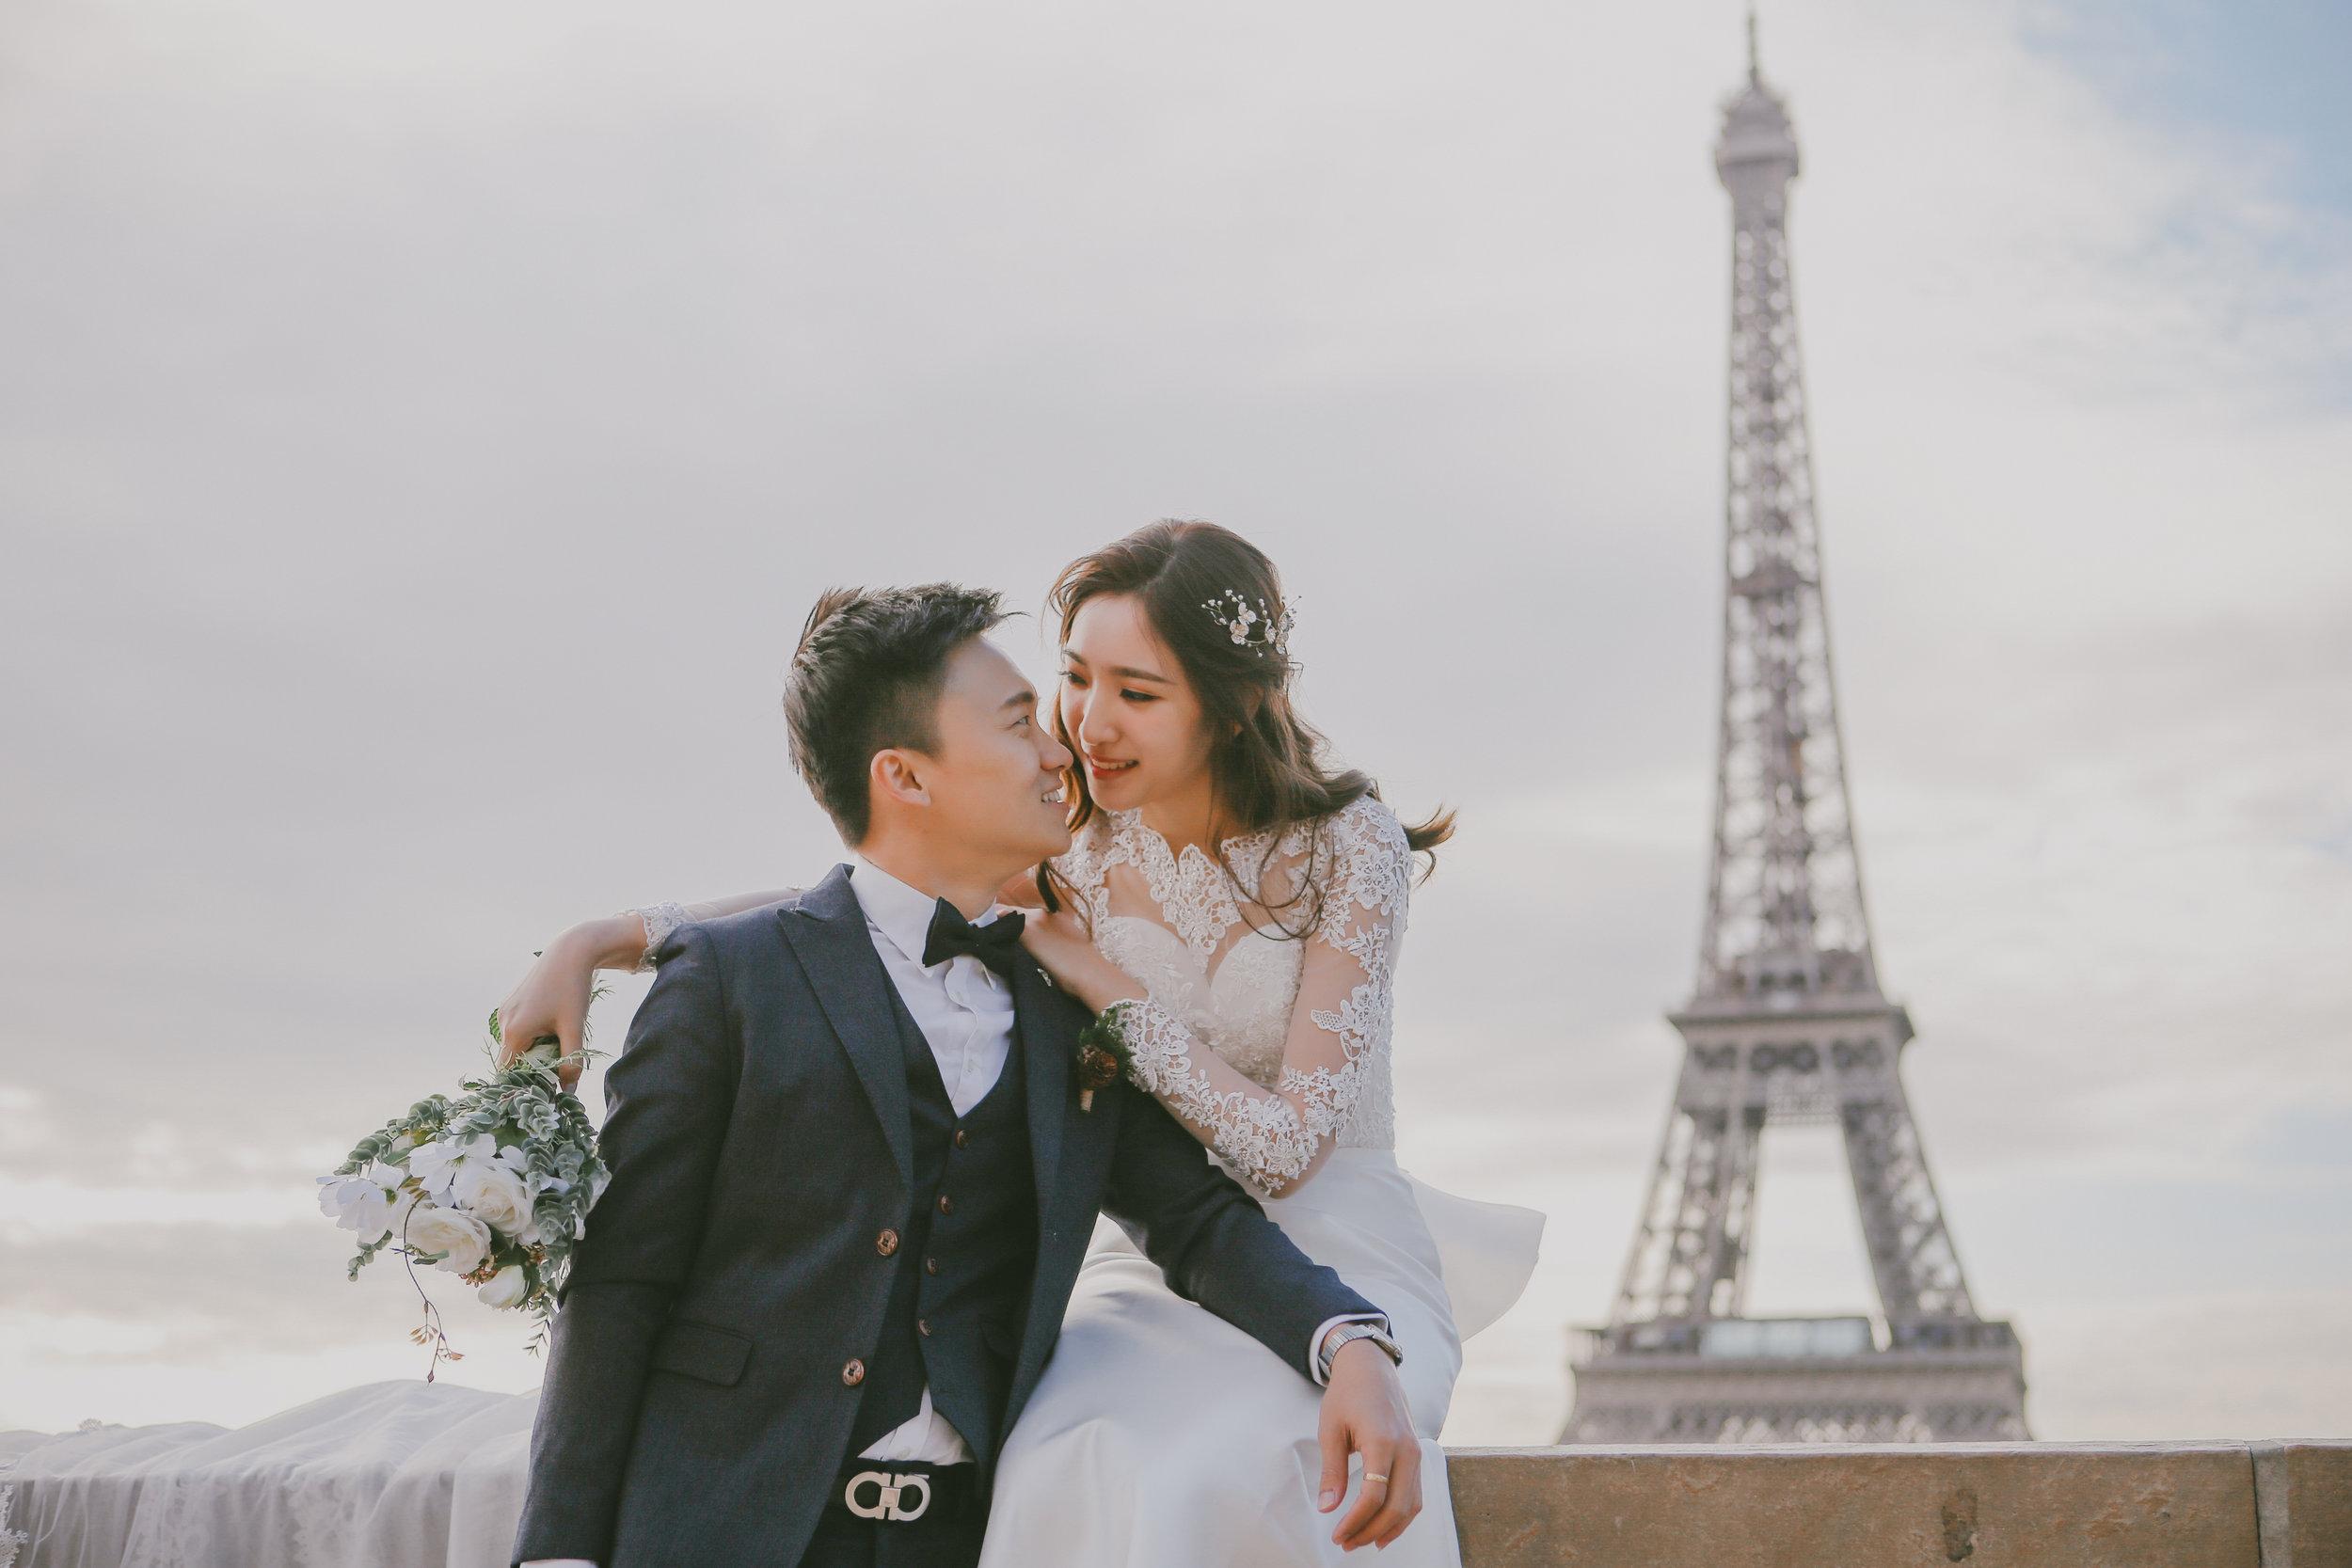 2018-pre-wedding-studio-numb9r-paris-high-1112e.jpg